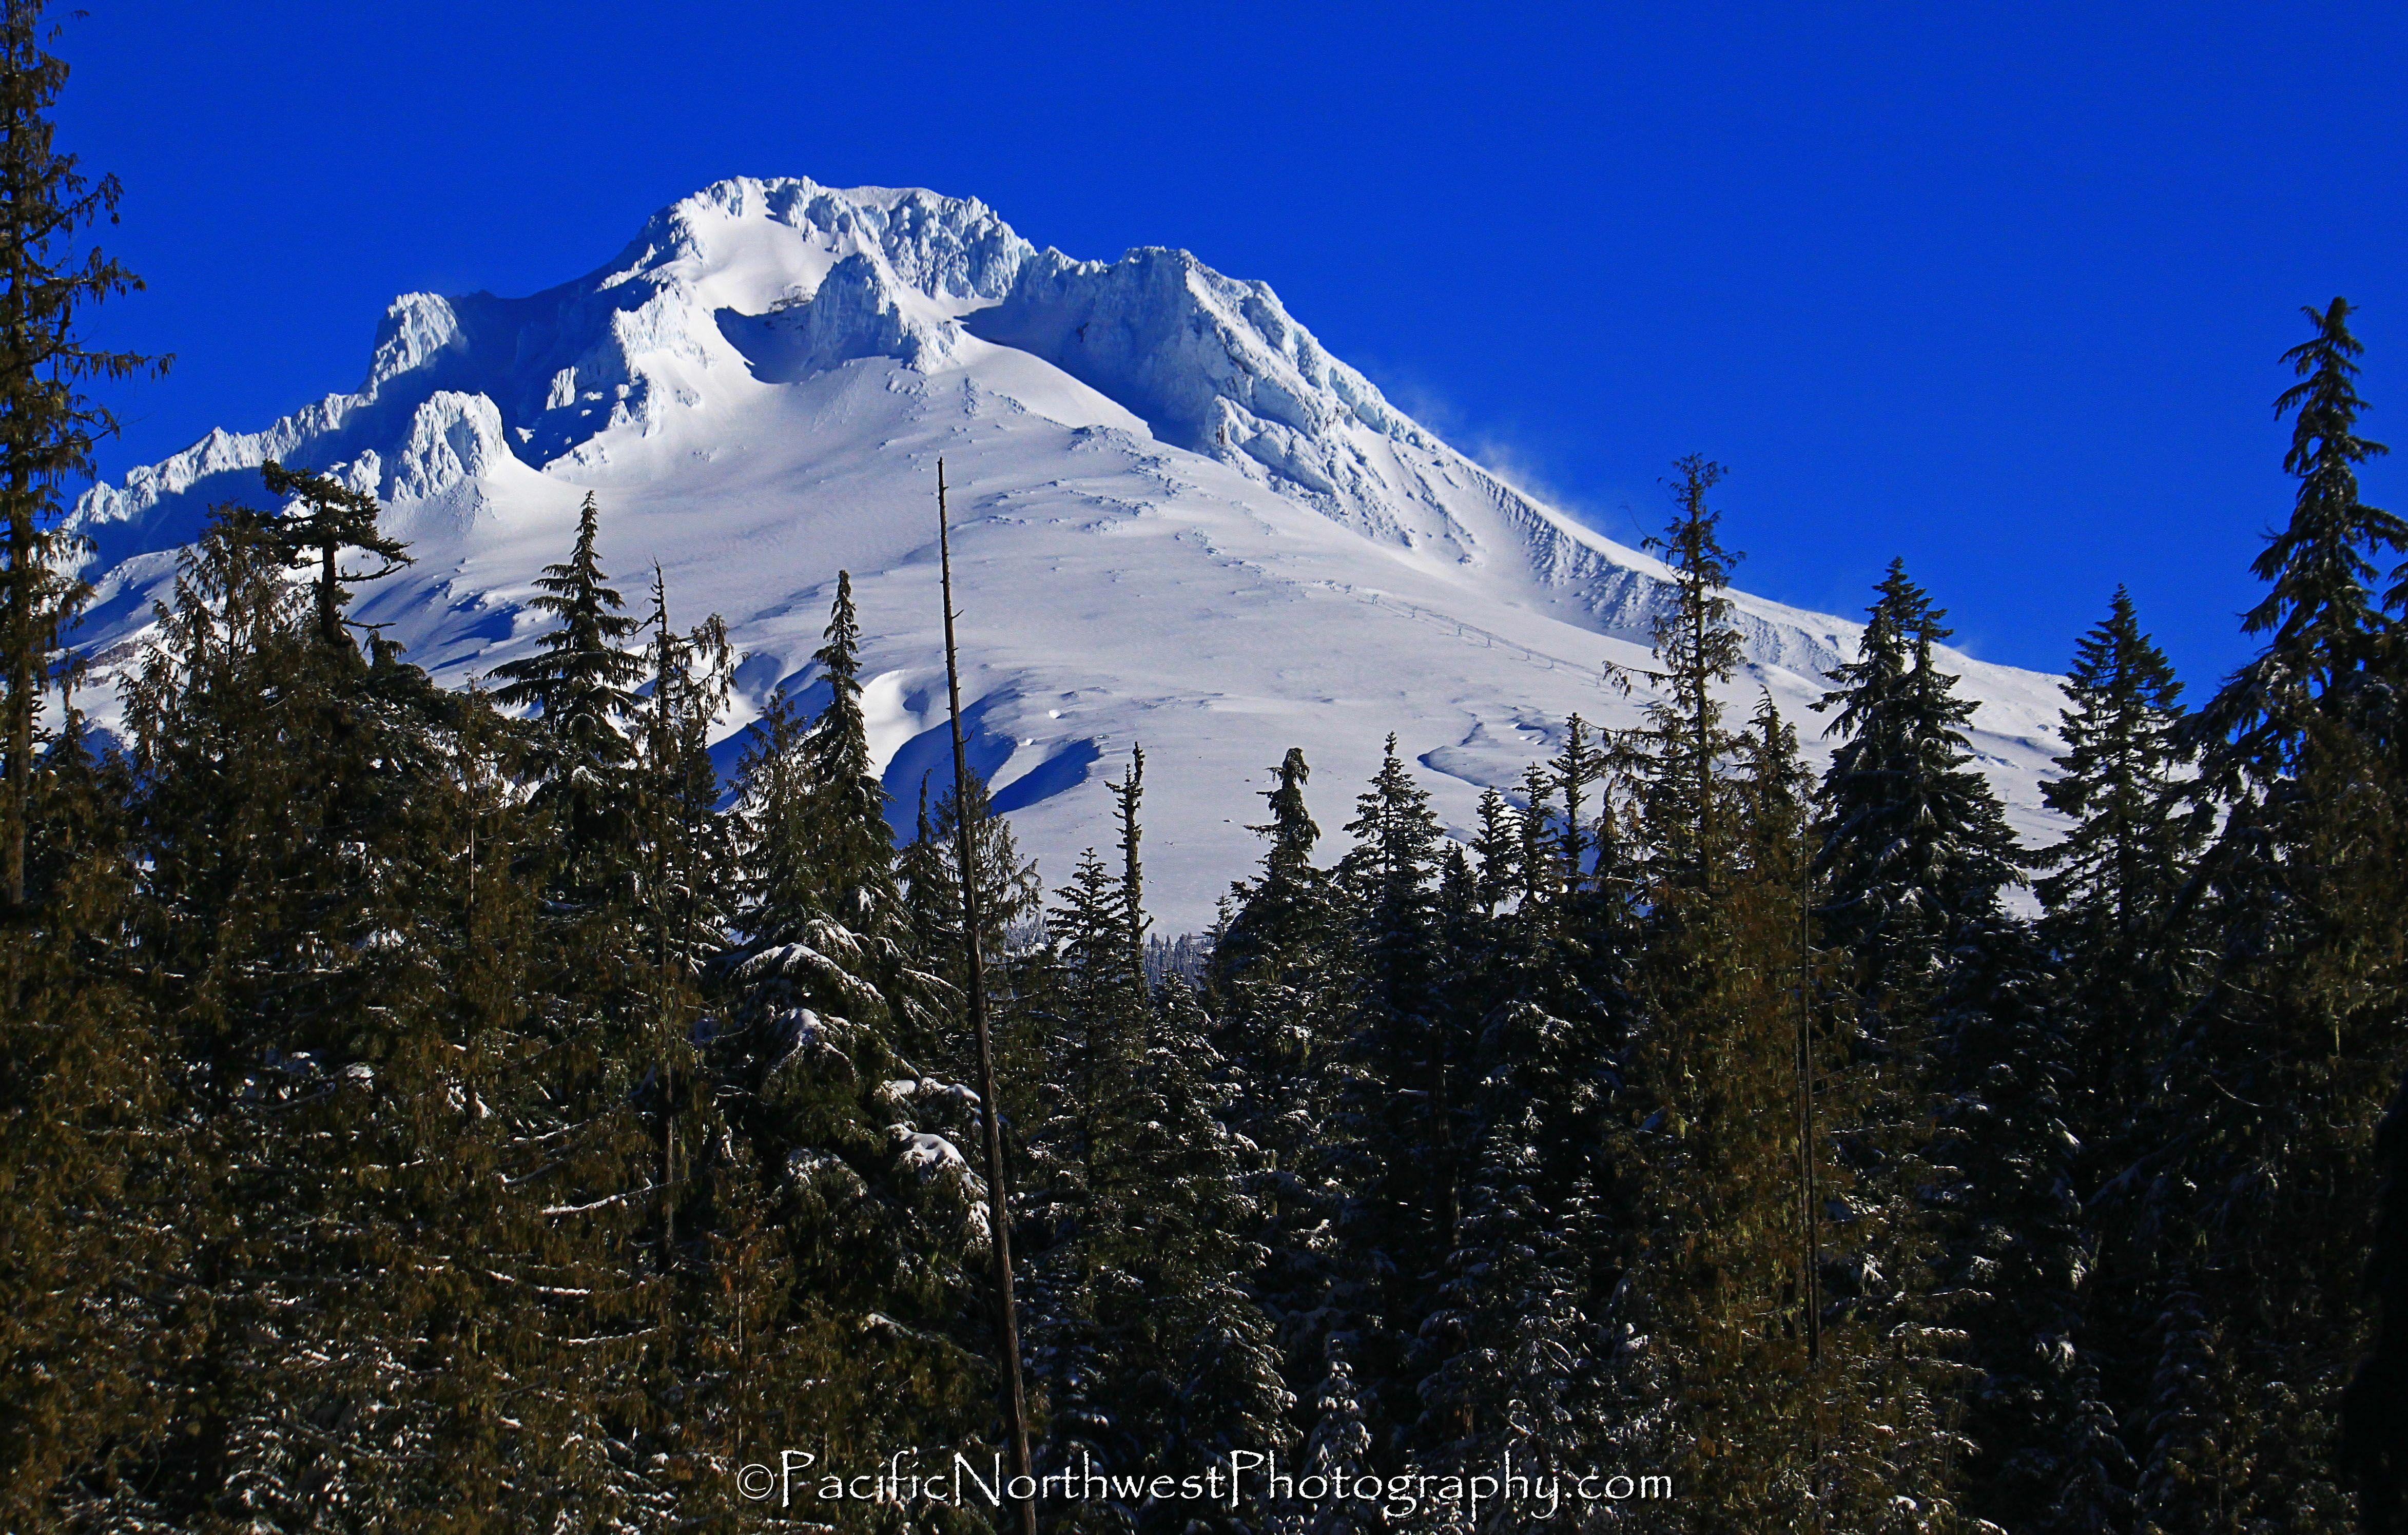 Mt. Hood and trees